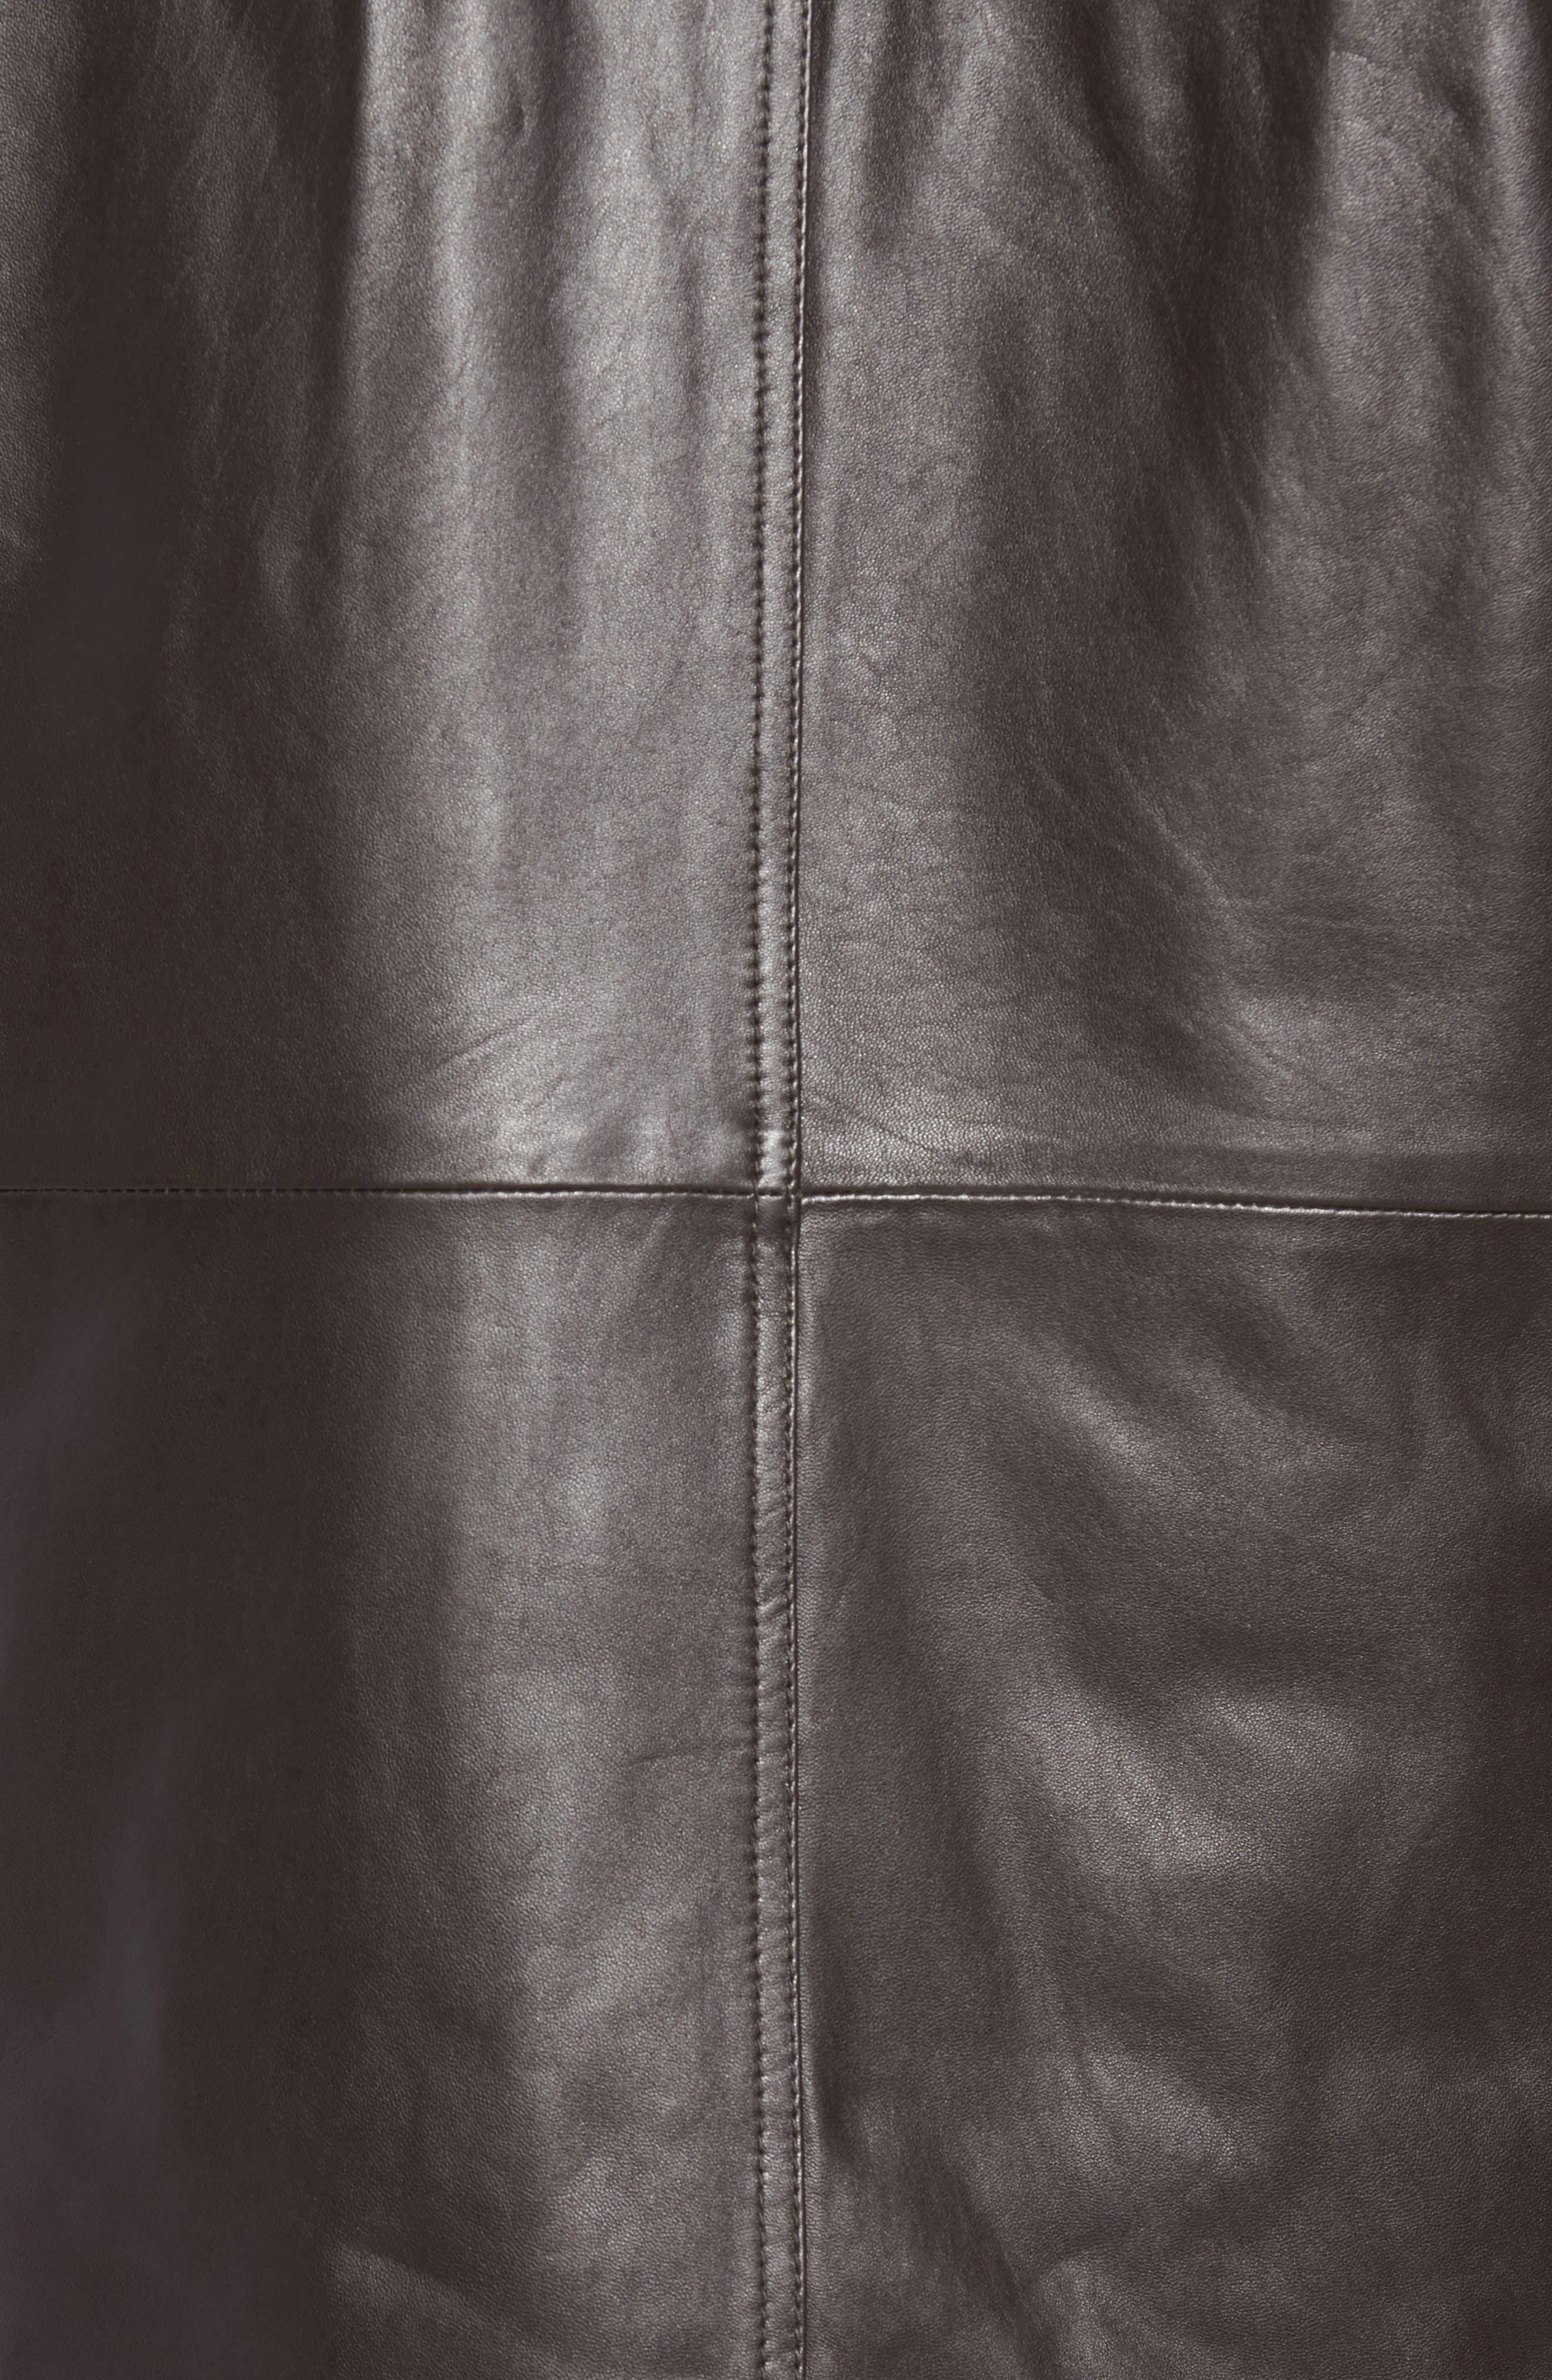 Middlebury Leather Car Coat with Genuine Rabbit Fur Trim,                             Alternate thumbnail 6, color,                             Espresso